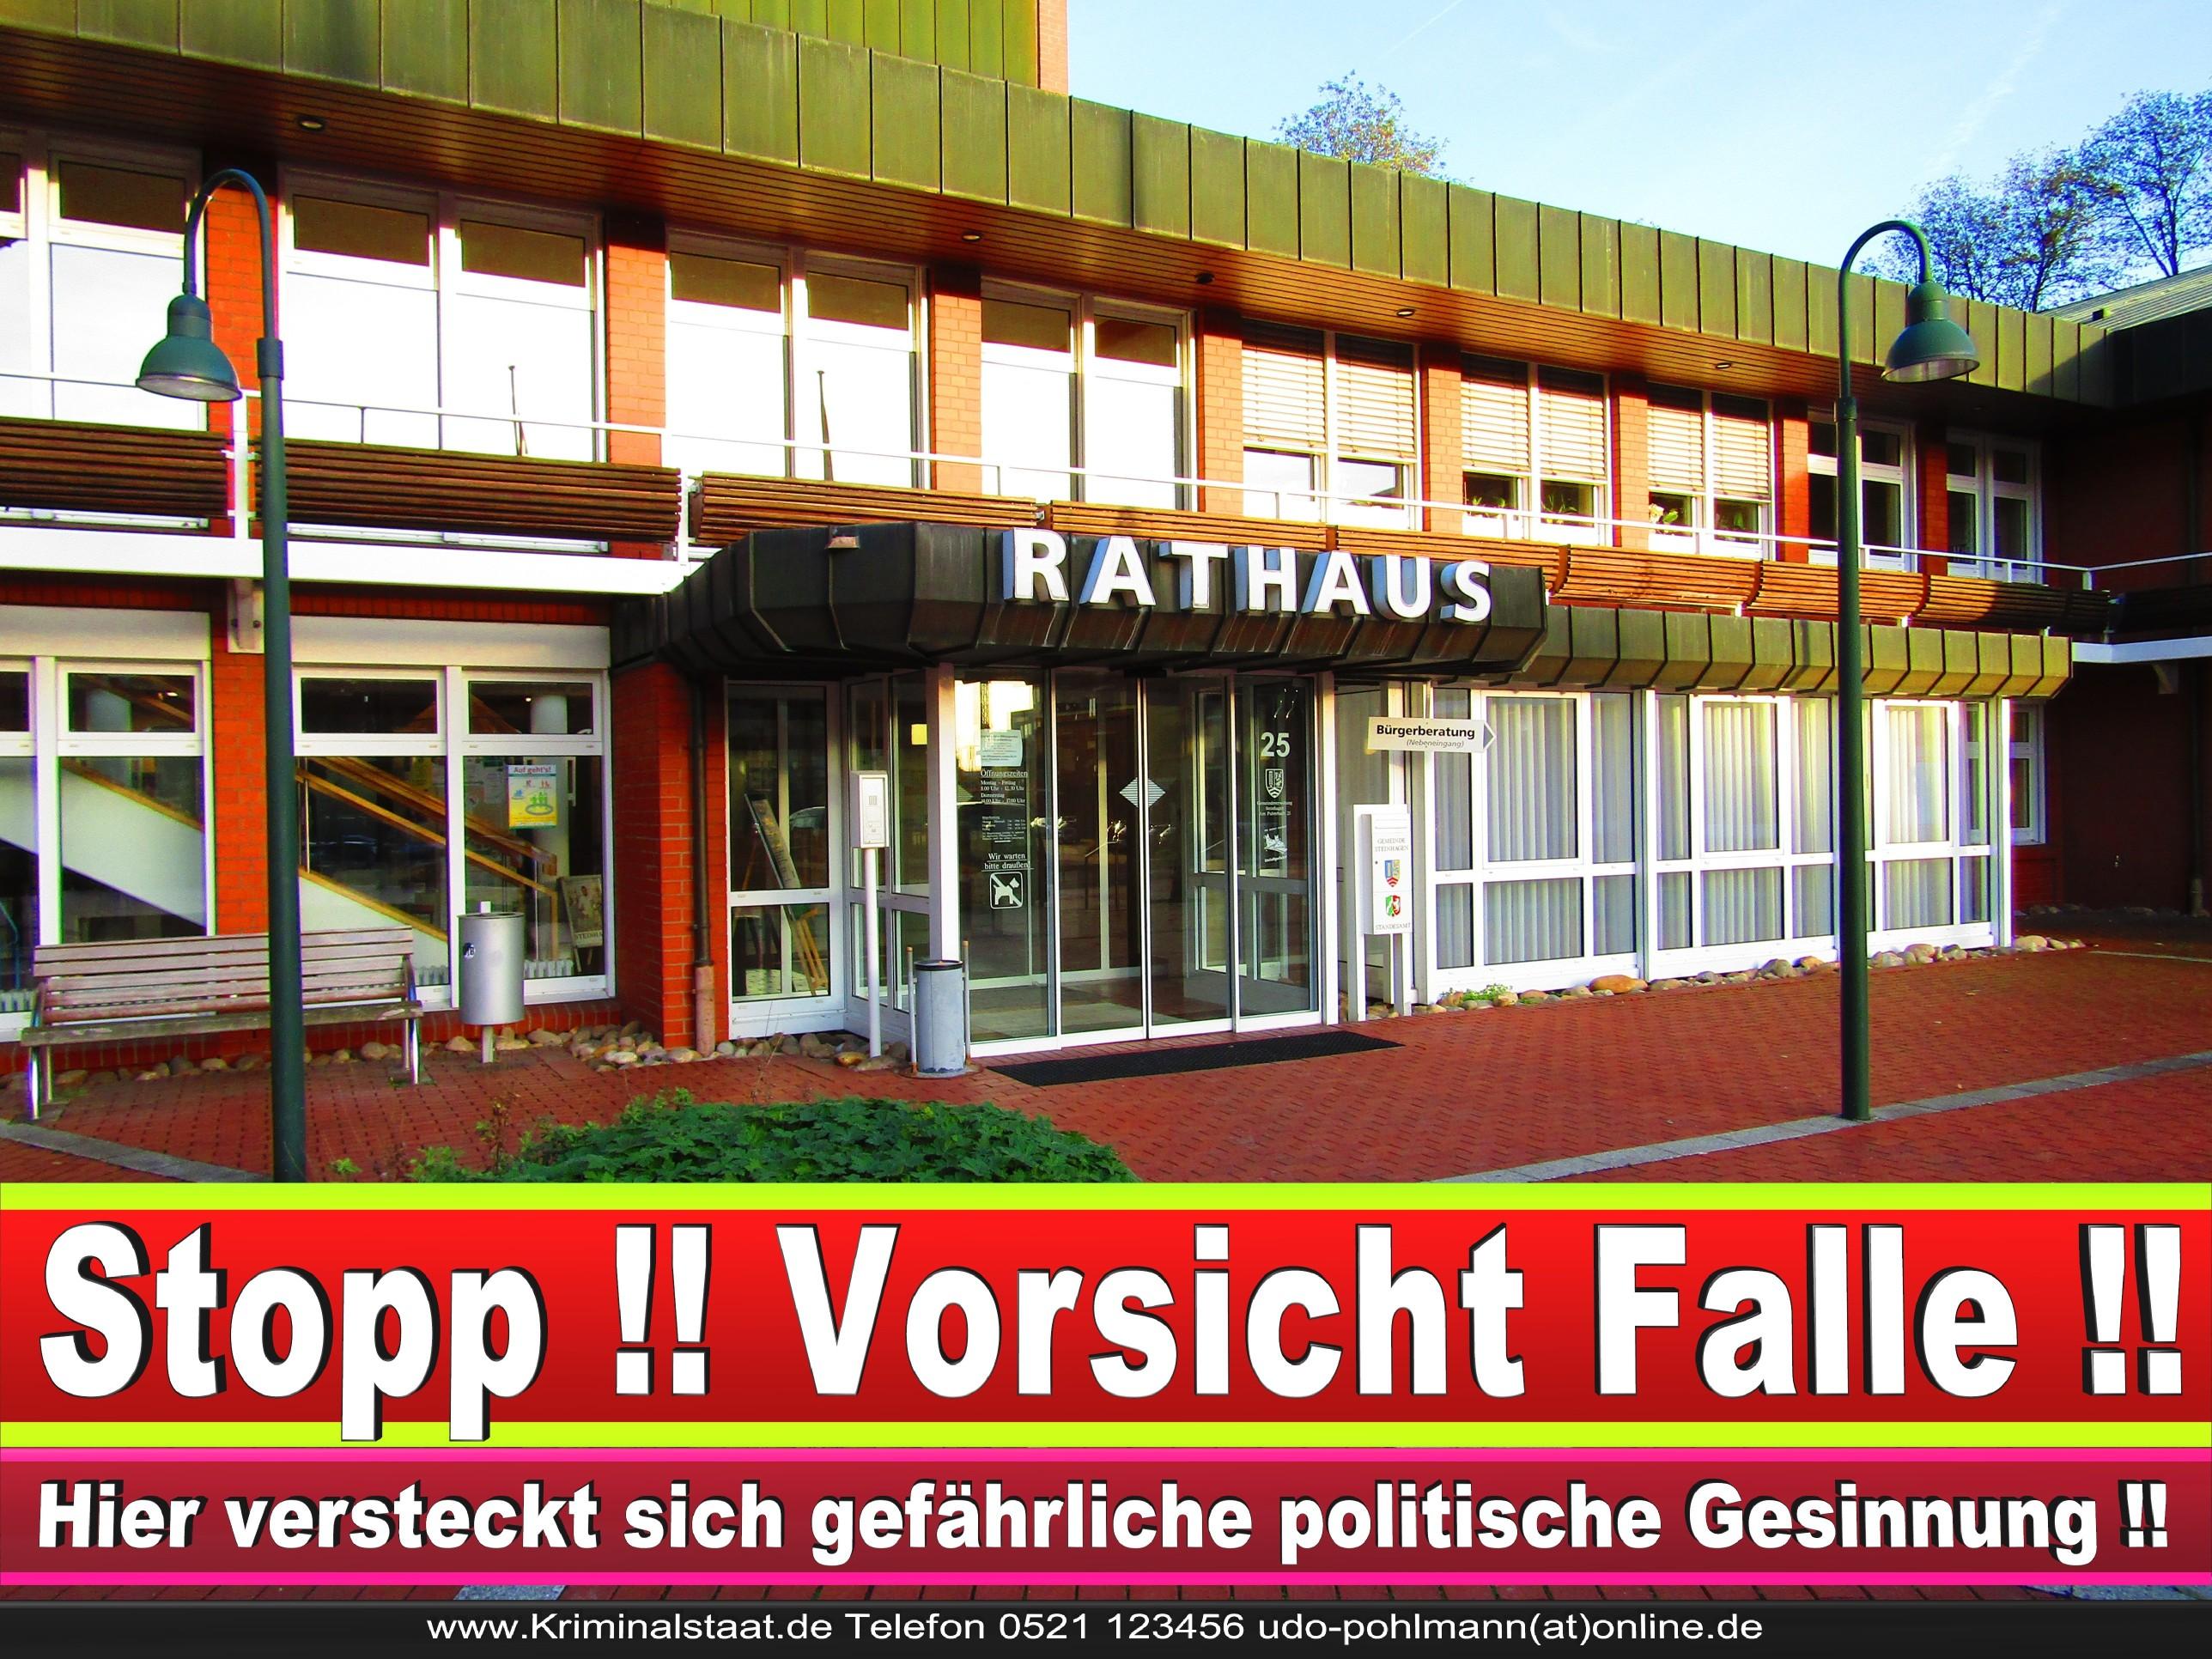 Rathaus Steinhagen CDU SPD FDP Ortsverband CDU Bürgerbüro CDU SPD Korruption Polizei Bürgermeister Karte Telefonbuch NRW OWL (18)